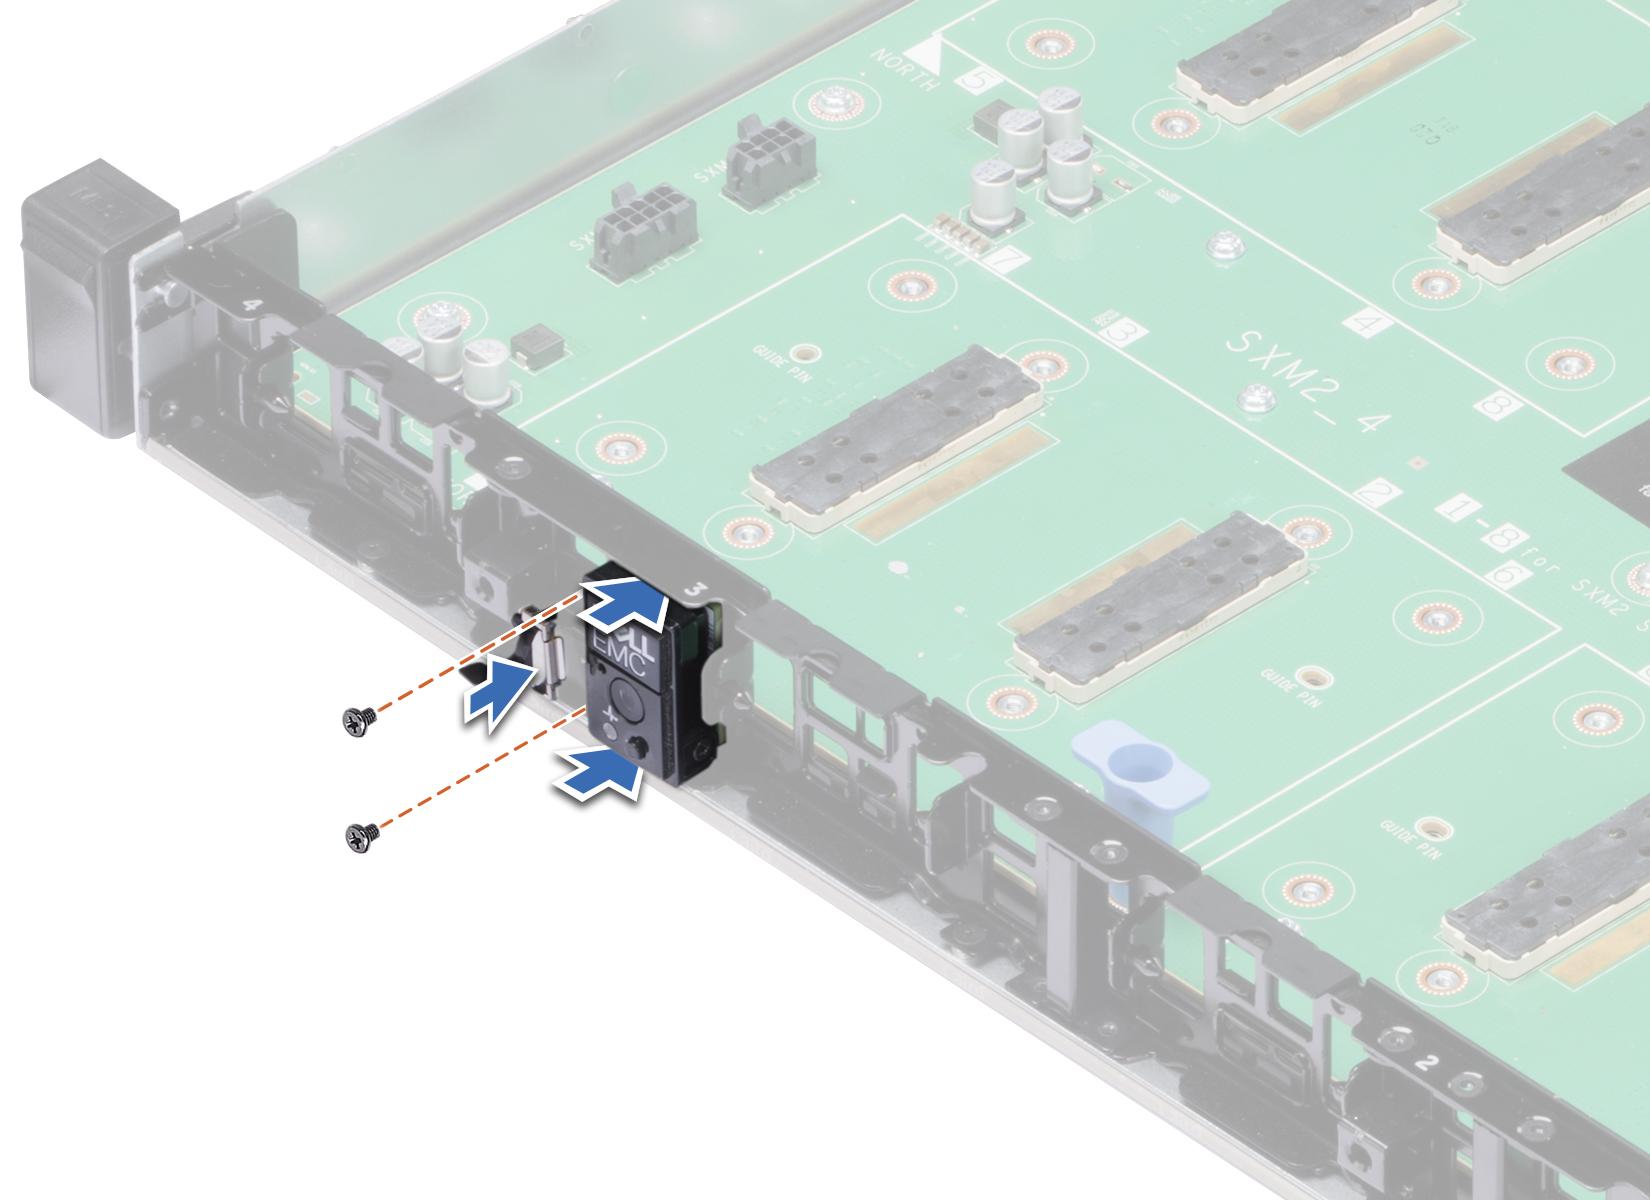 Dell EMC PowerEdge C4140 Installation and Service Manual